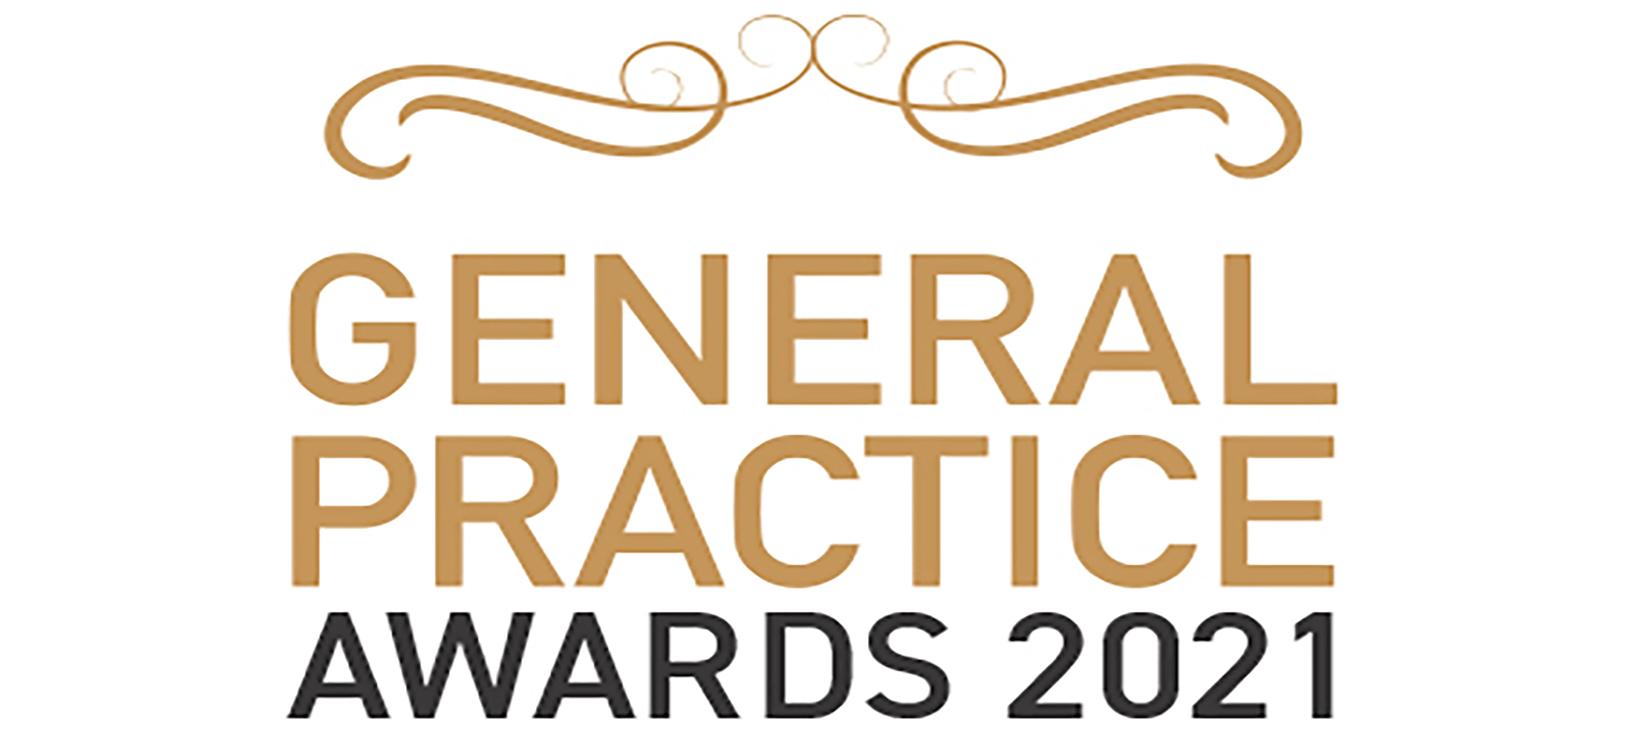 General Practice Awards